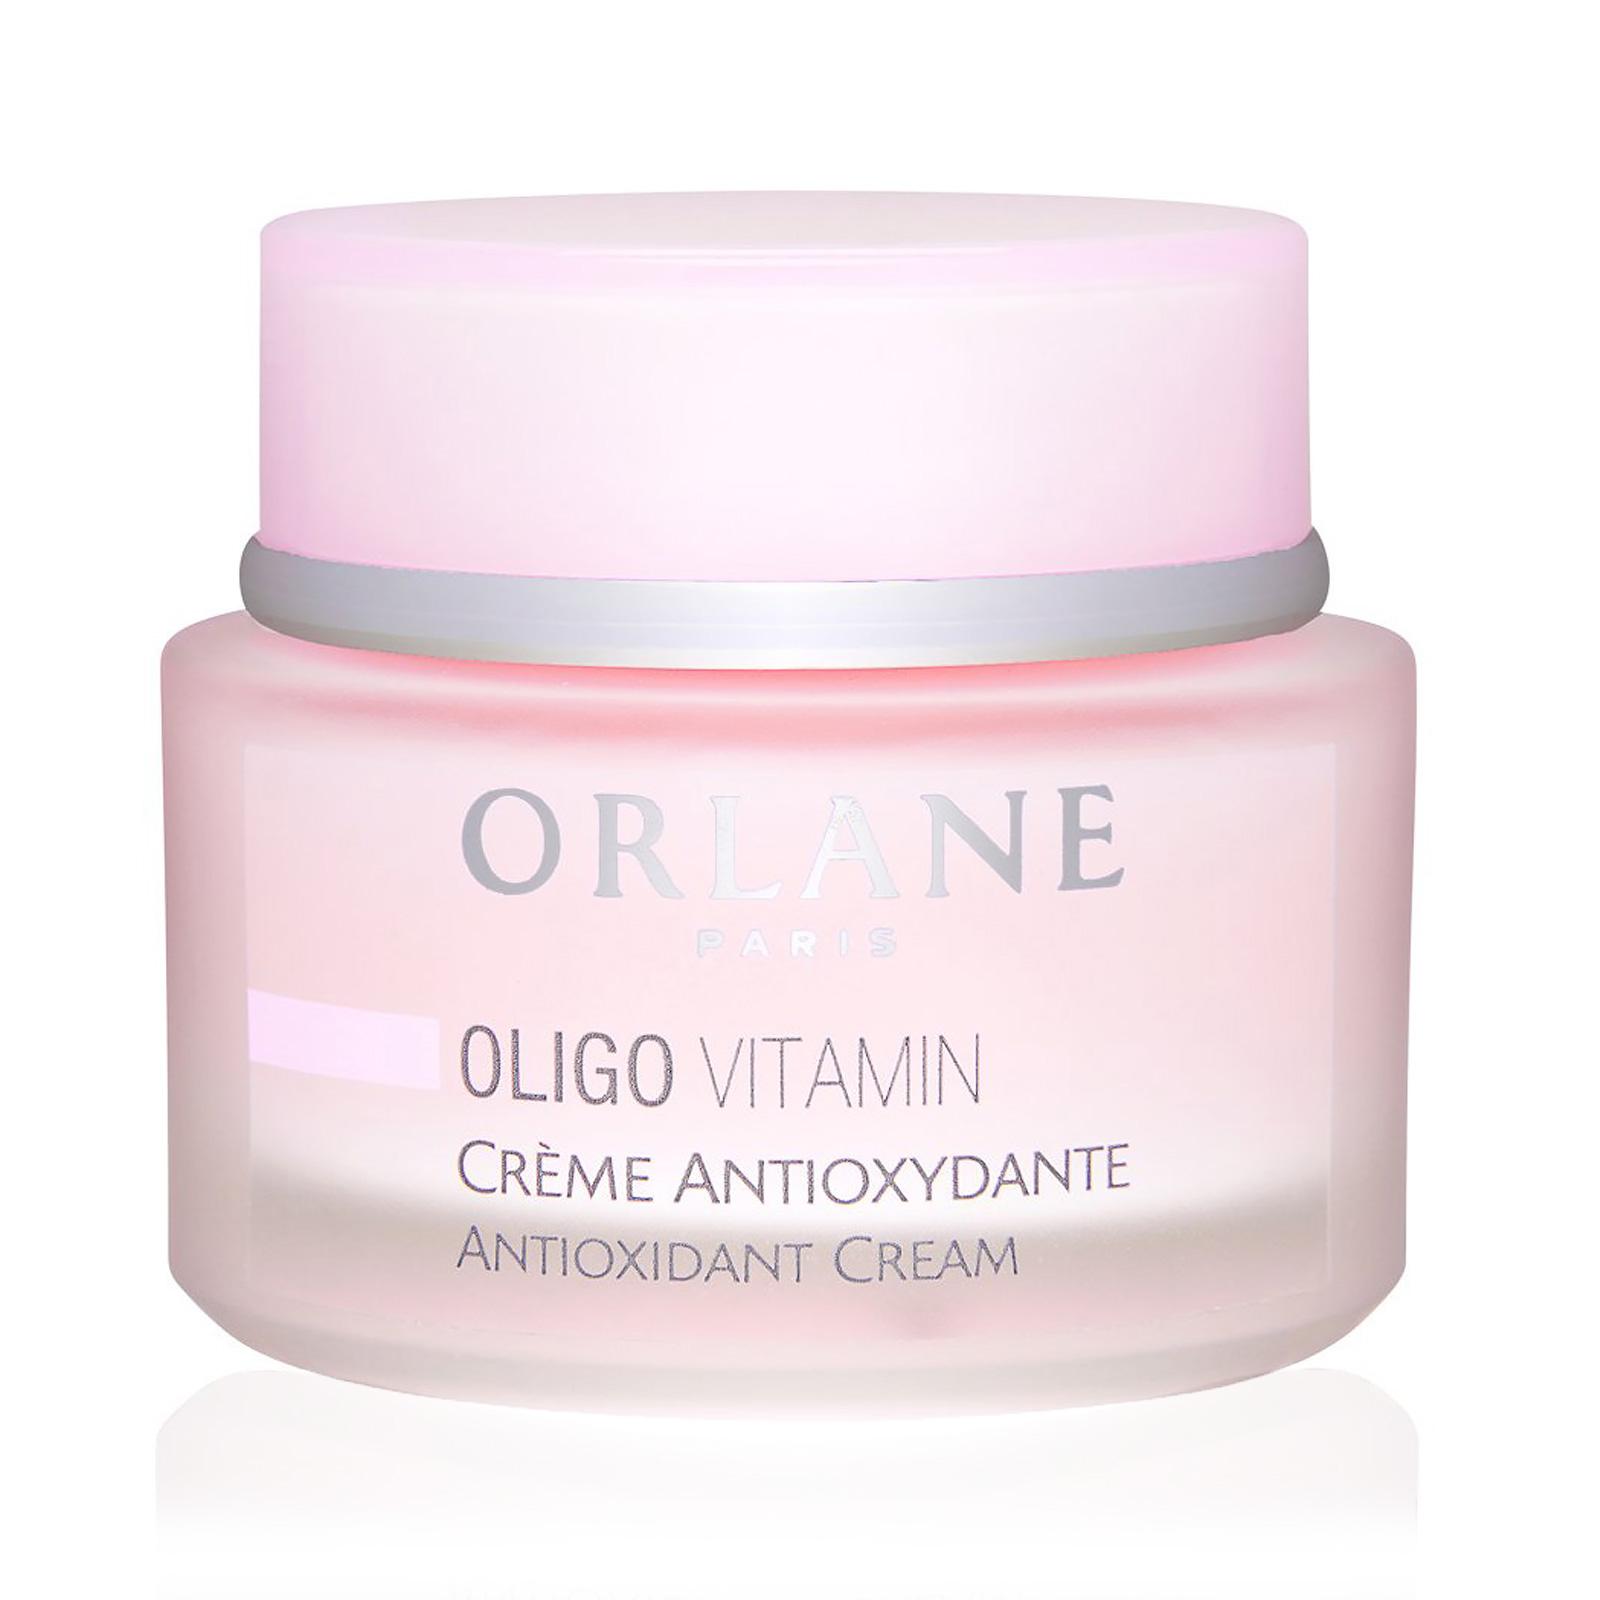 Oligo Vitamin Antioxidant Cream